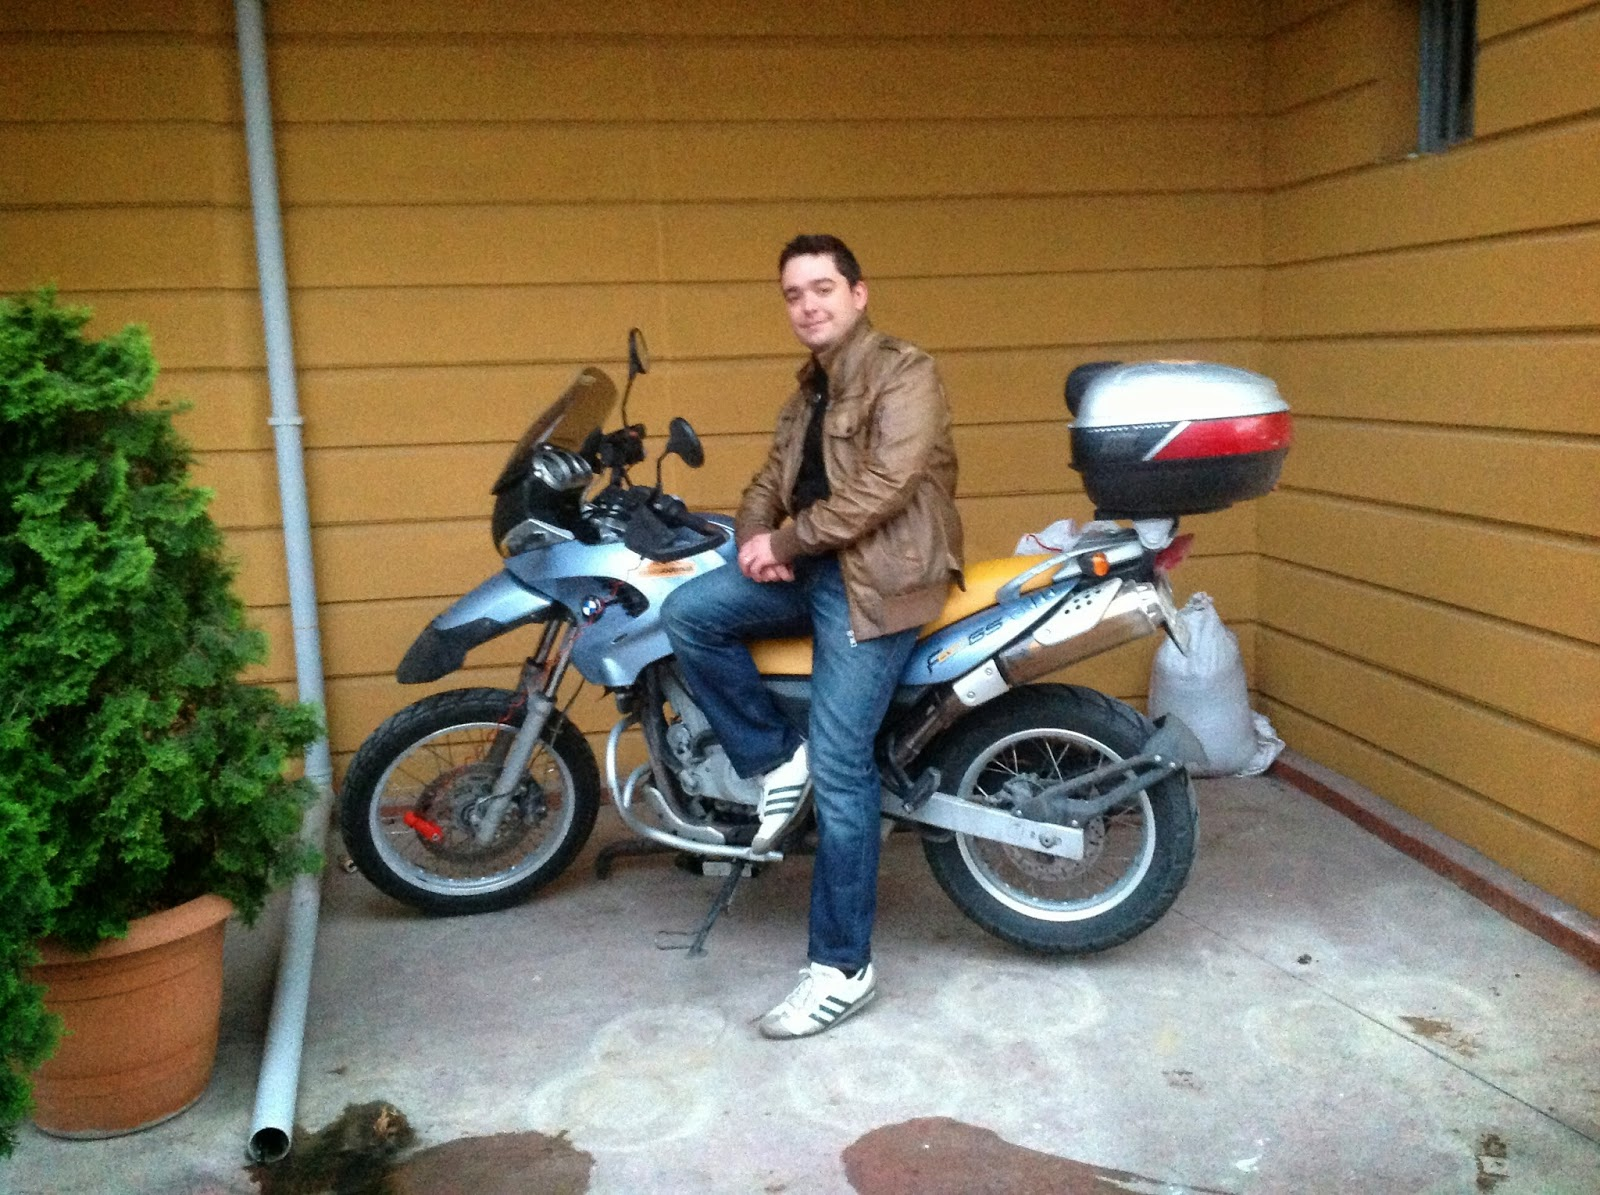 Motorsiklet Gunluklerim Bmw 2000 Model F650 Gs Gezilerim